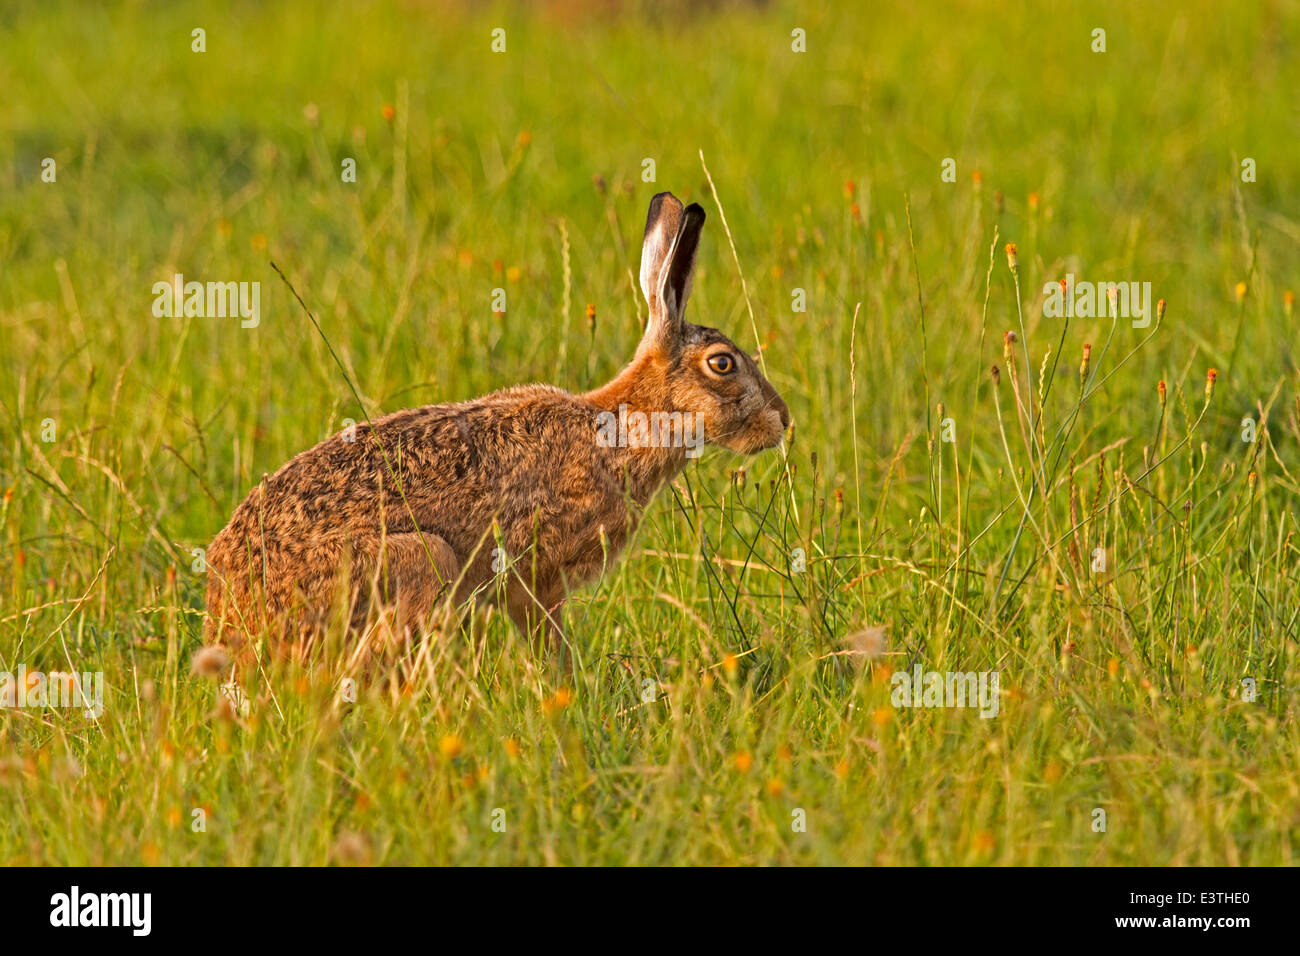 European hare / Lepus europaeus - Stock Image